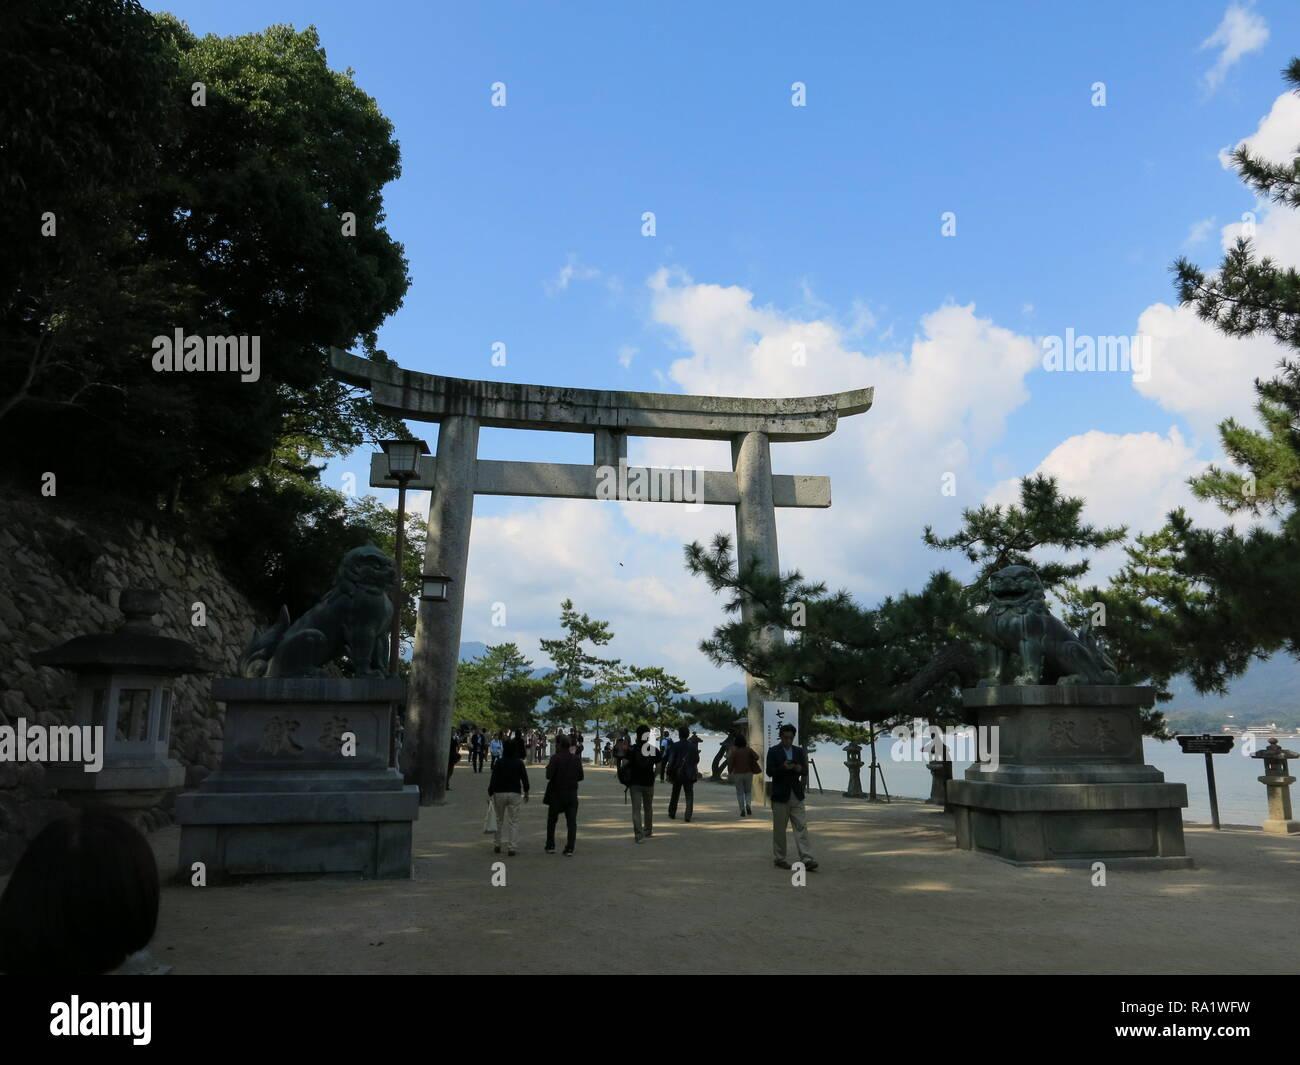 A stone torii gate and a pair of lion statues (Foo Dogs) guard the Mikasanohama approach to the Itsukushima Shrine on Miyajima Island, Japan - Stock Image